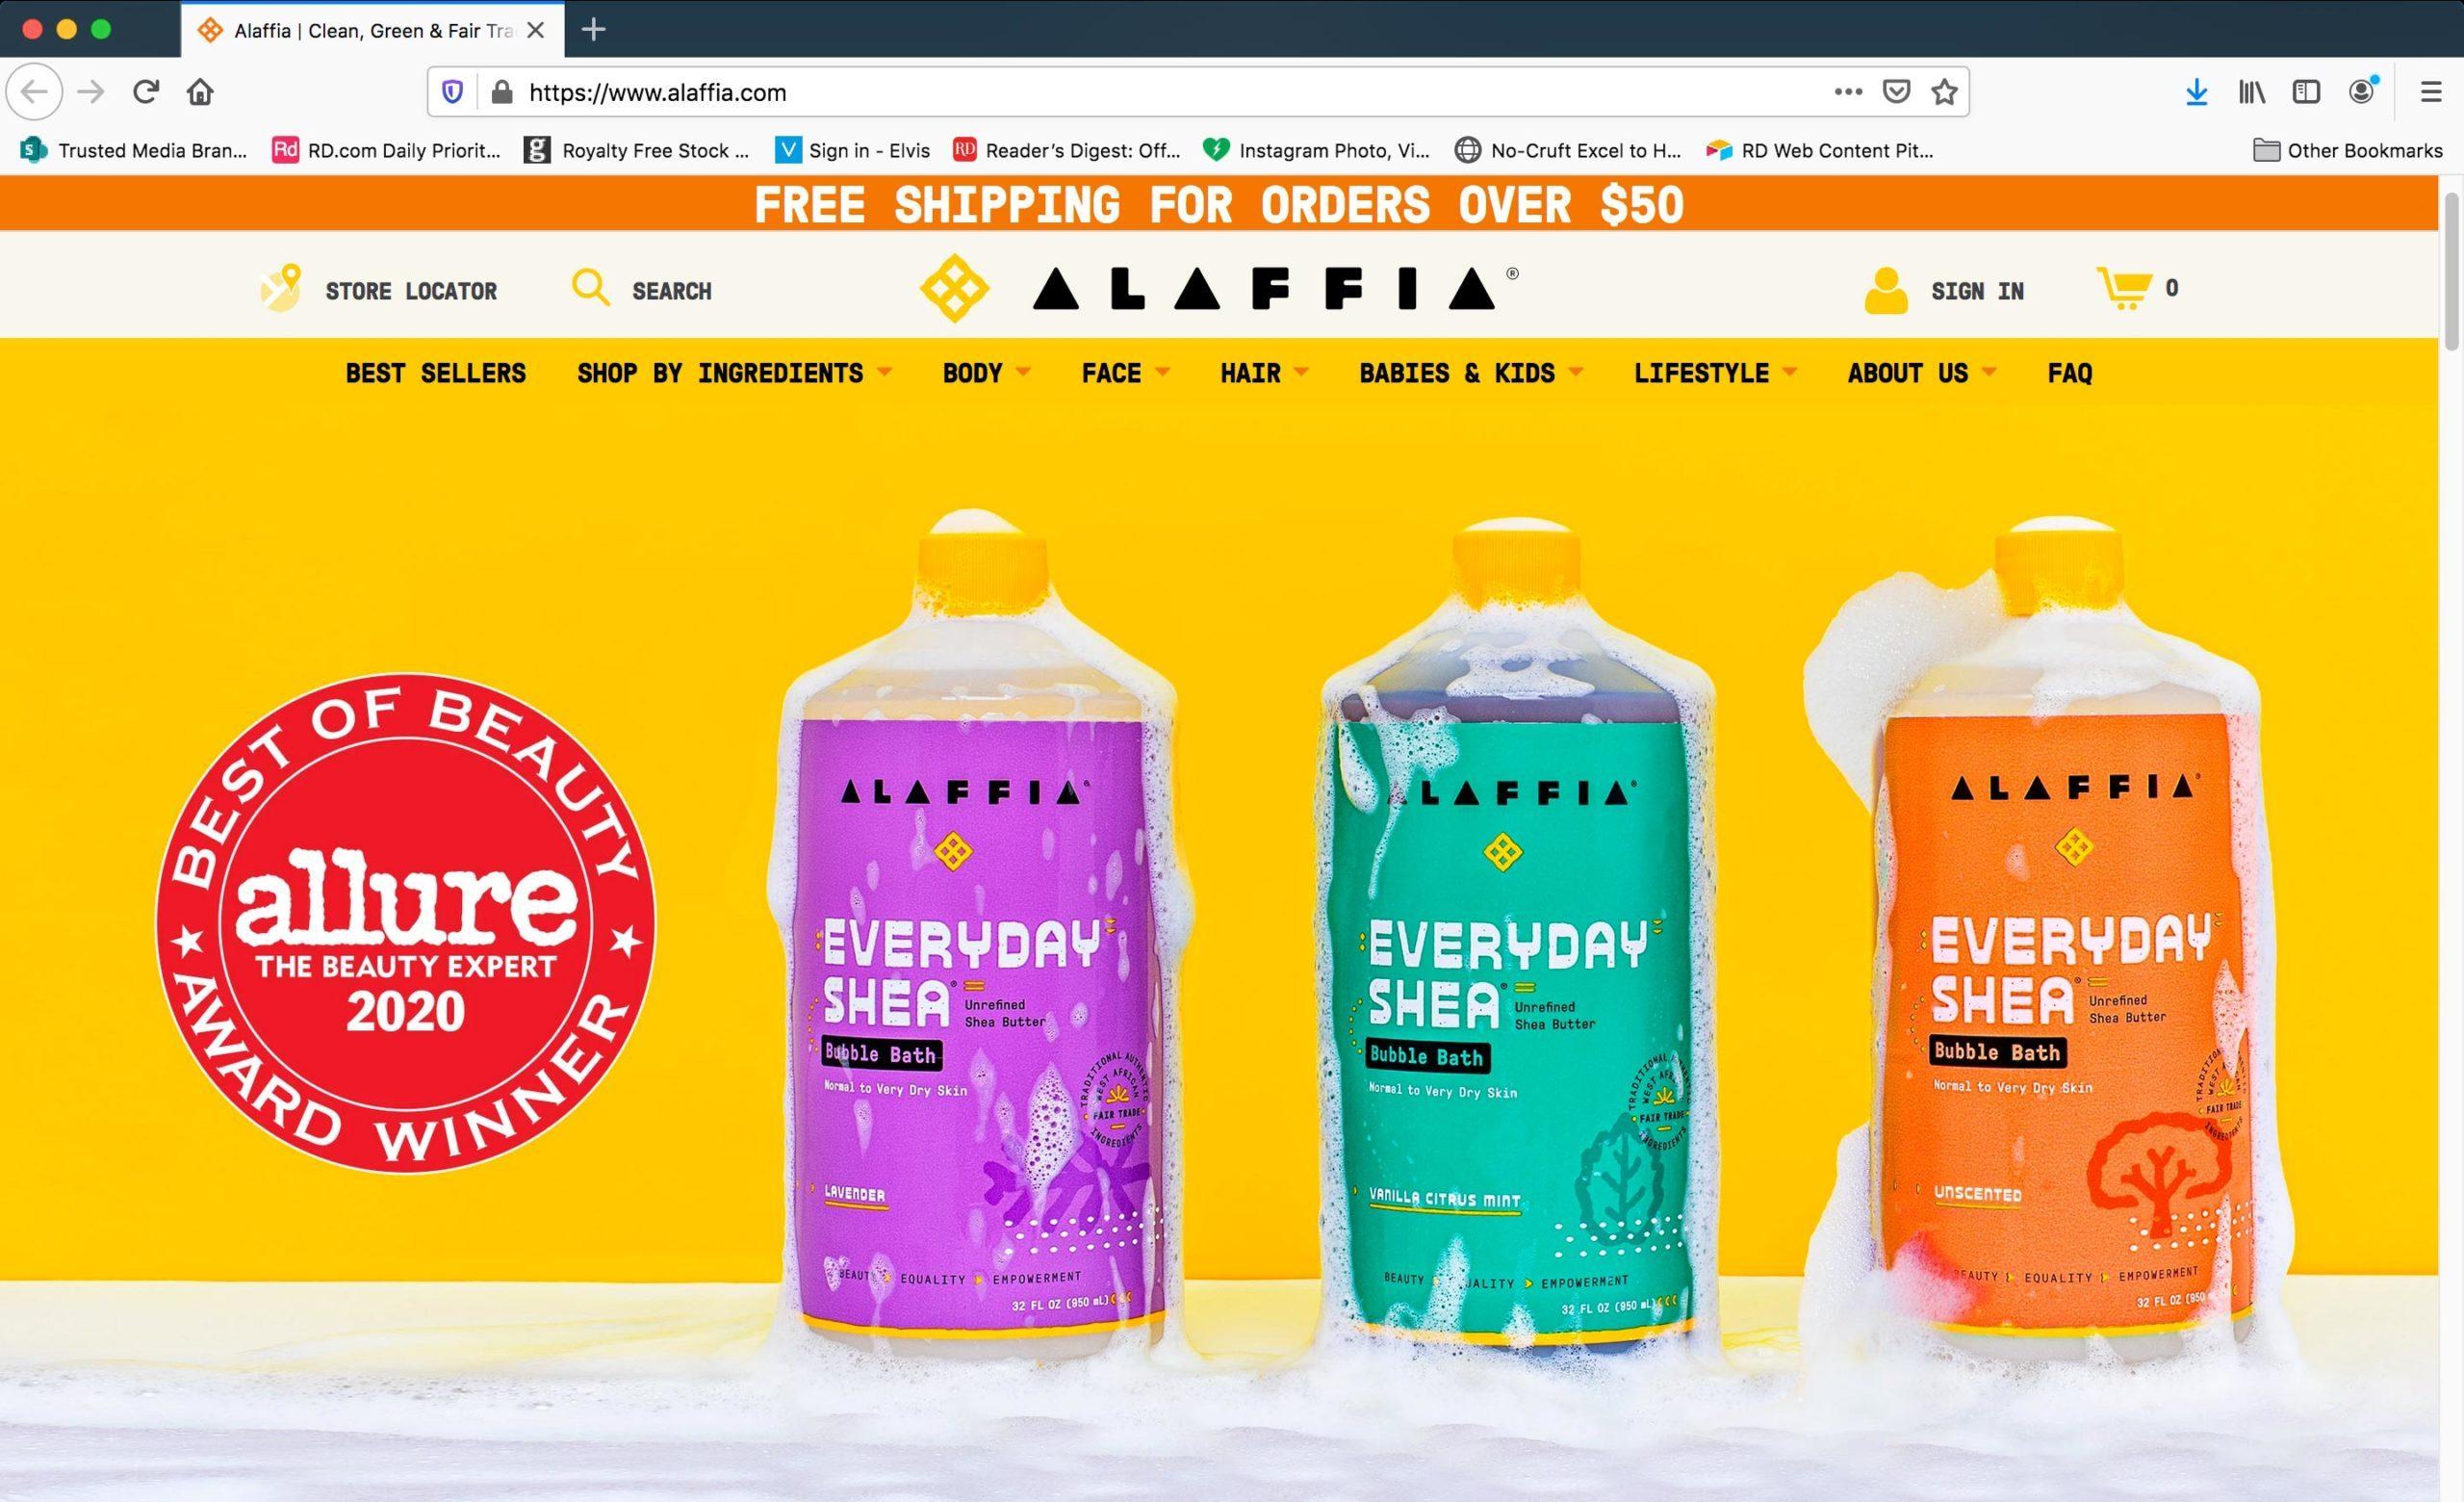 Homepage Of Alaffia.com